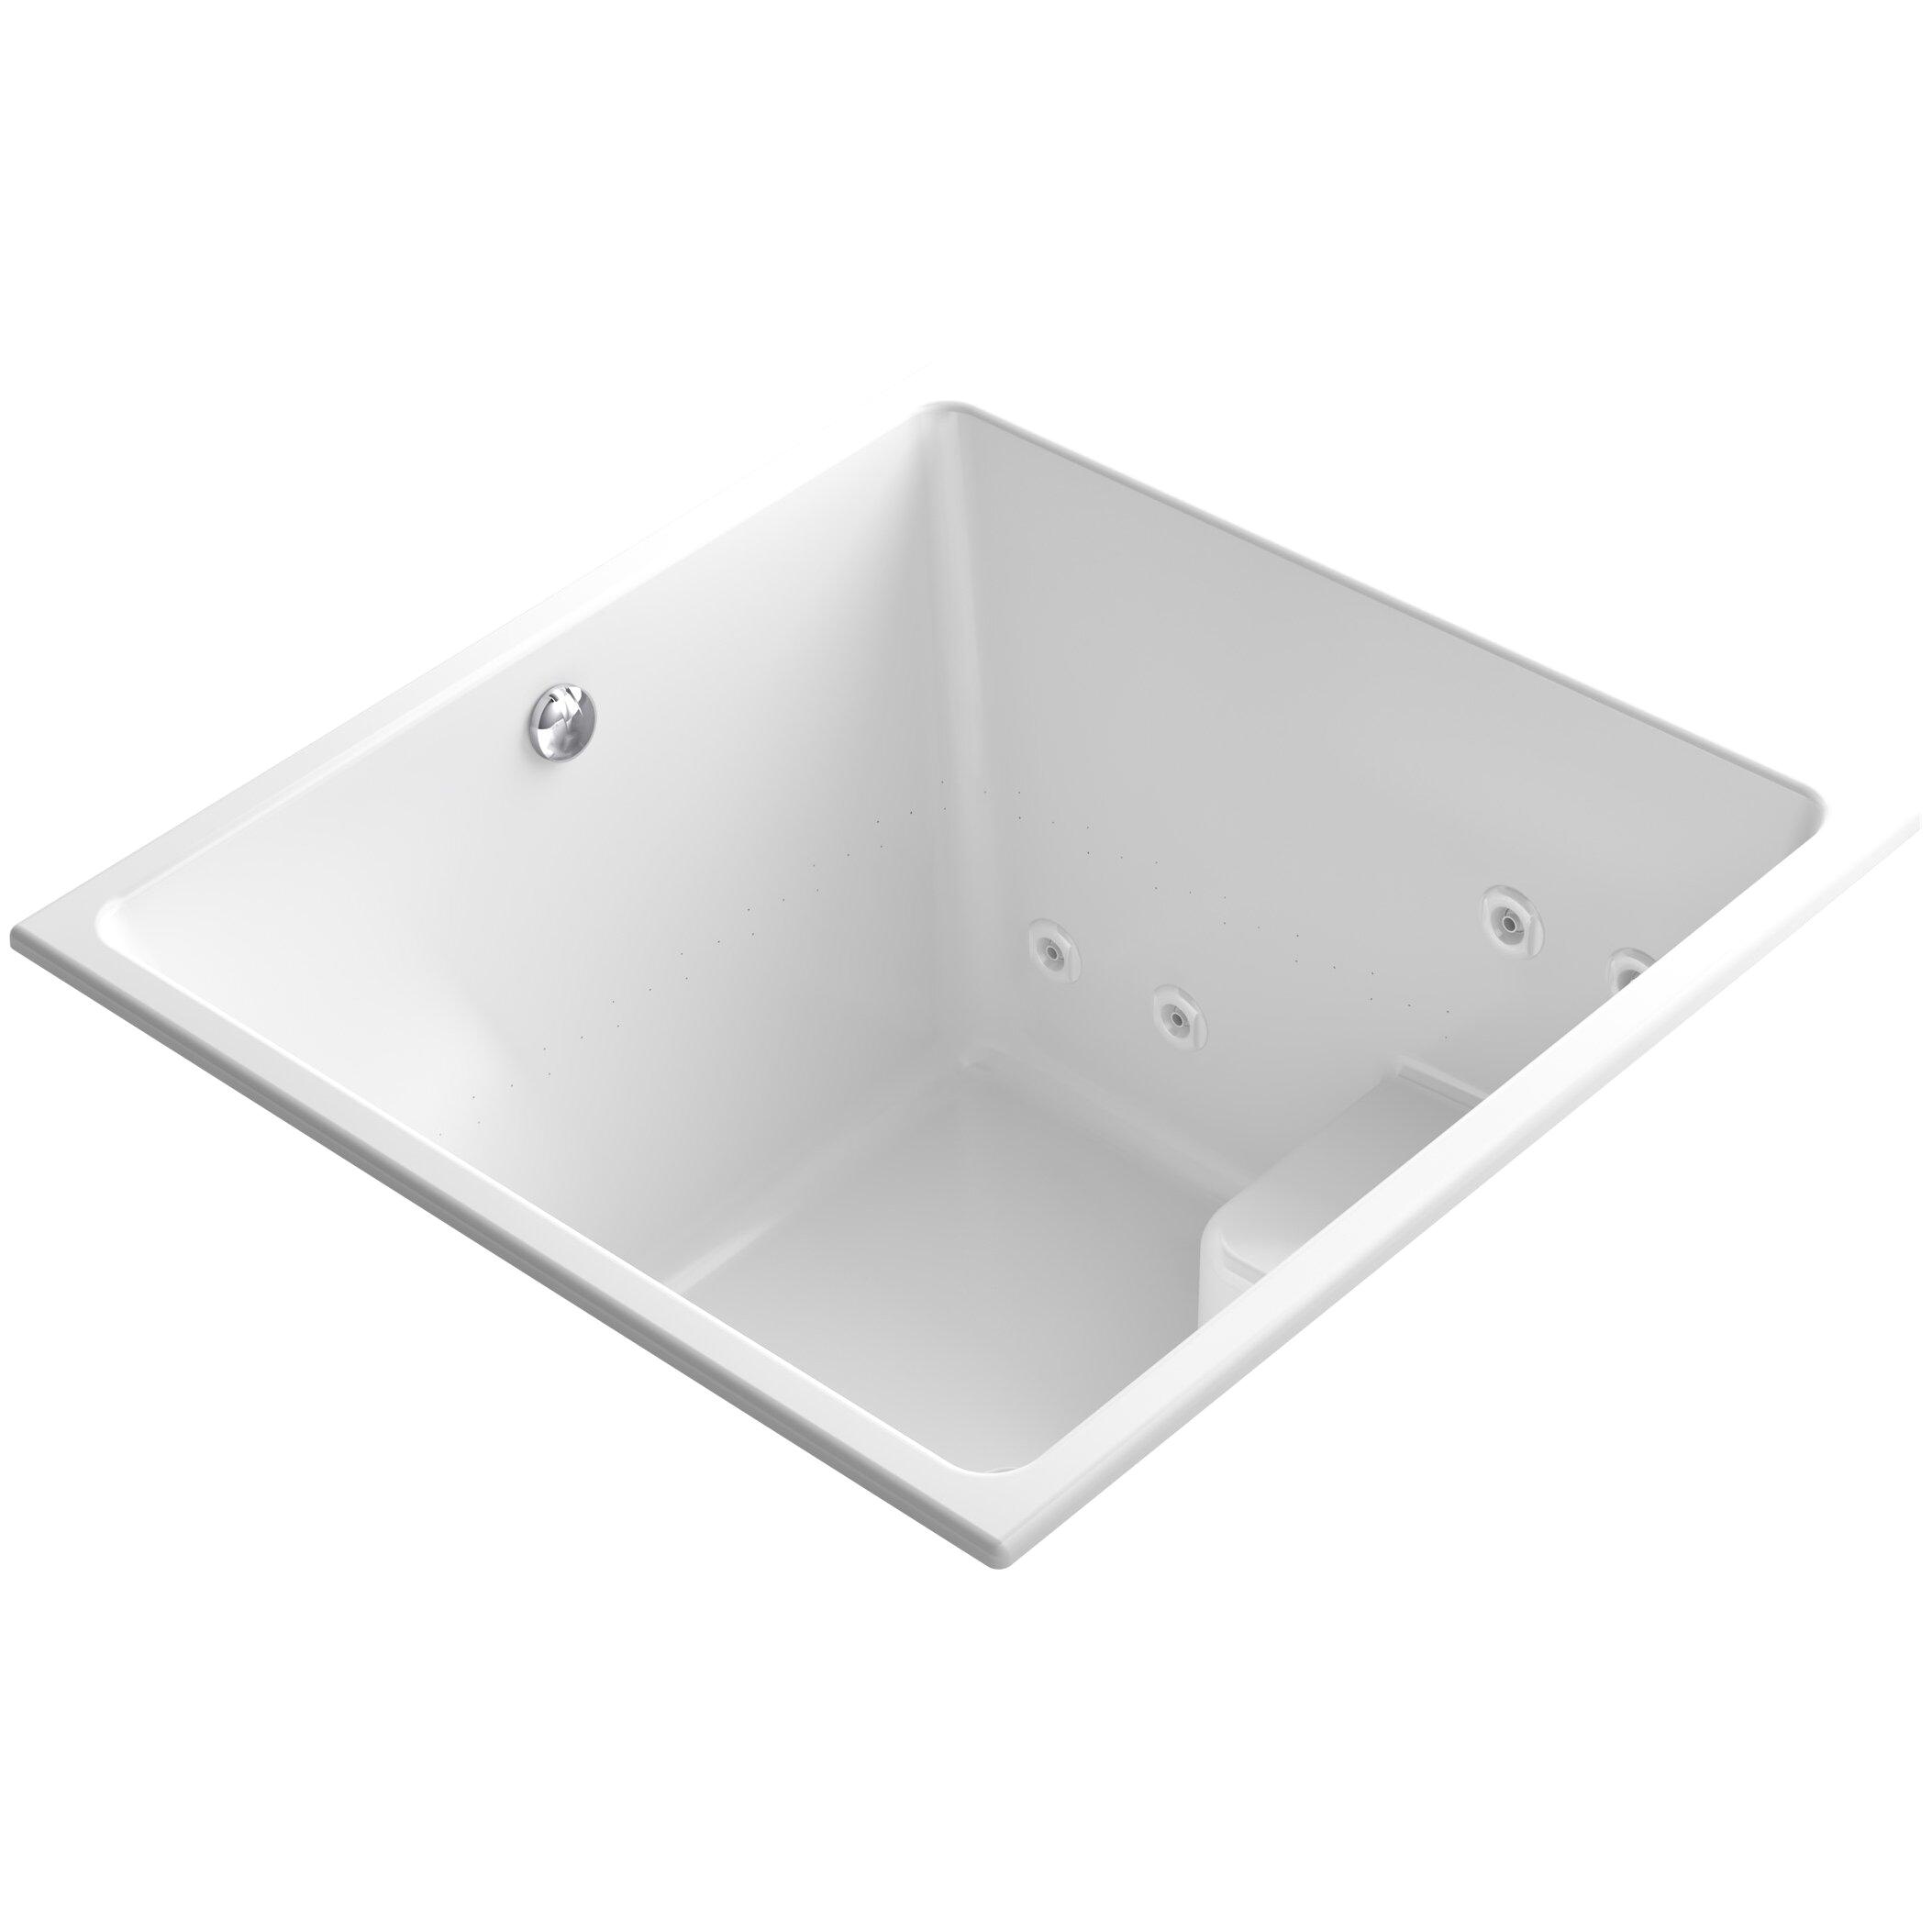 Underscore 48 x 48 Drop in Whirlpool and BubbleMassage Air Bathtub K 1969 XH2G KOH